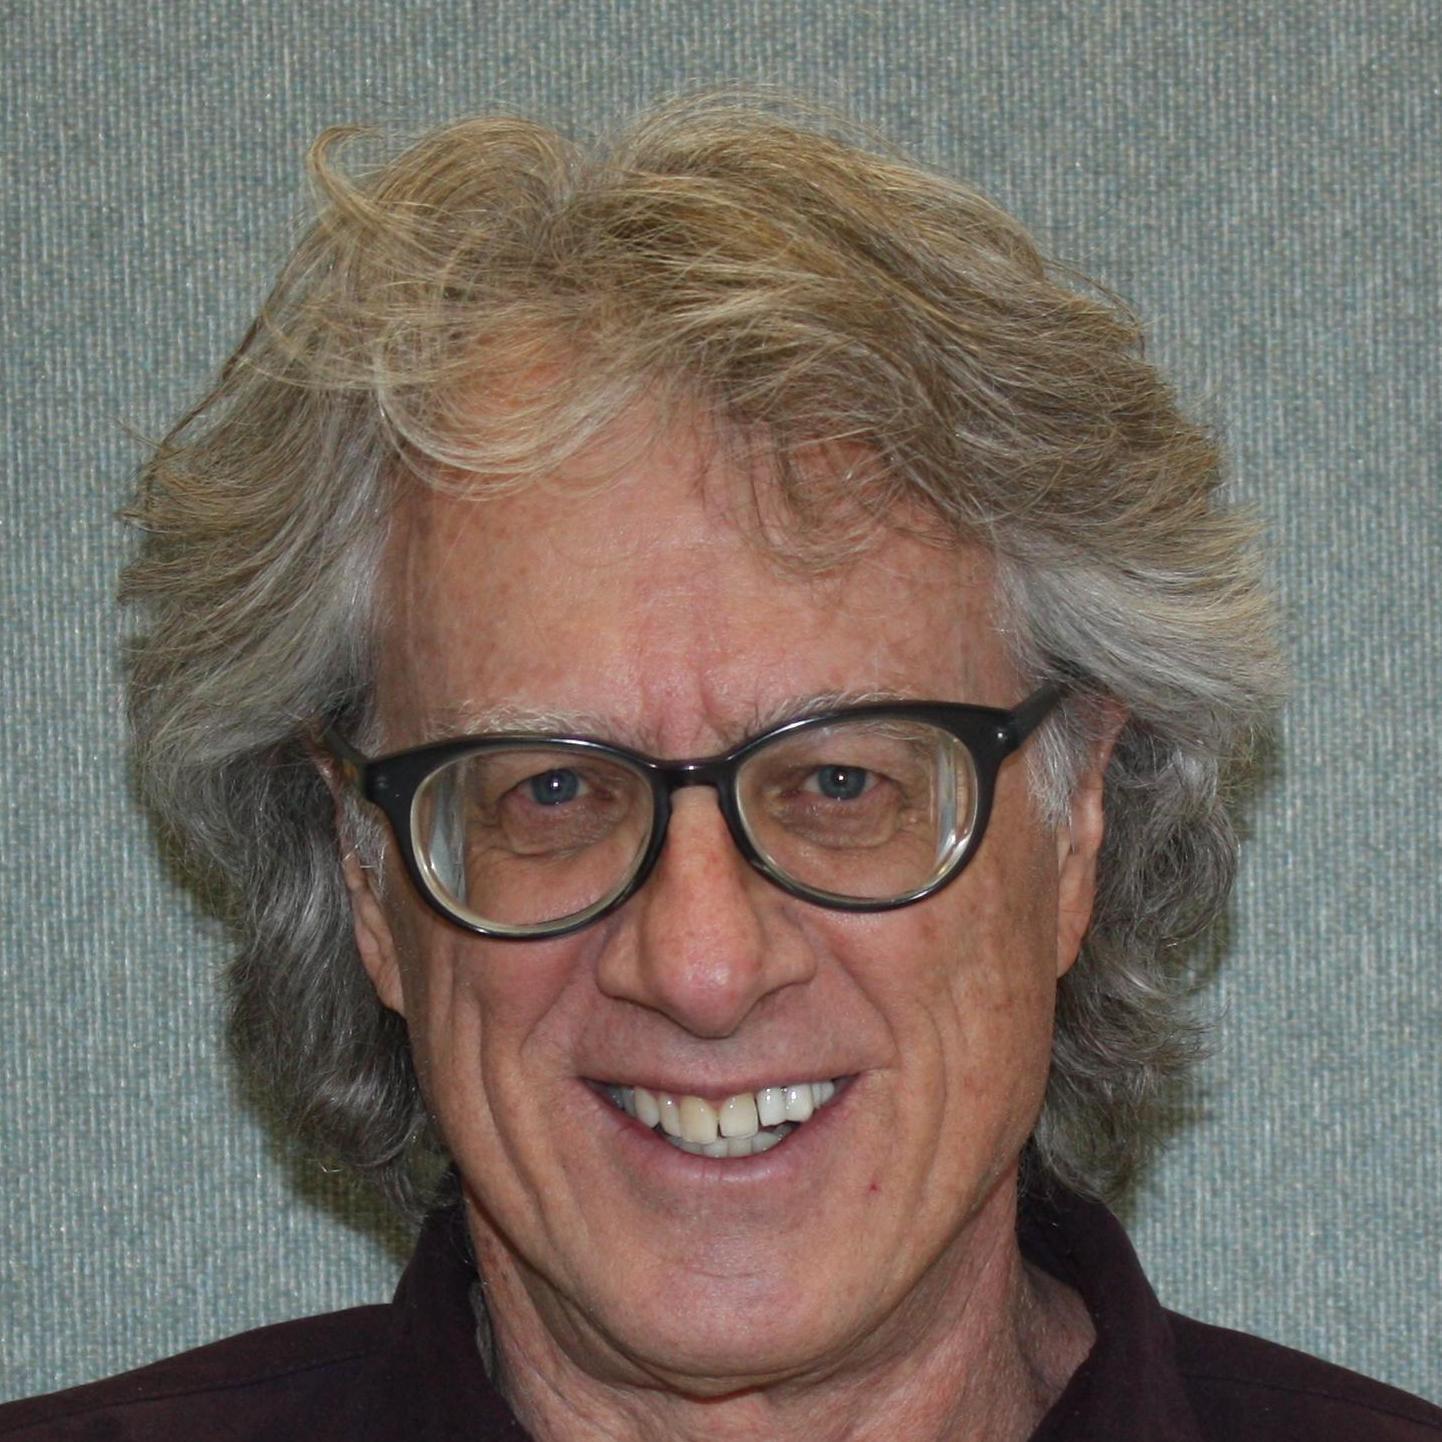 Virgil holgate's Profile Photo